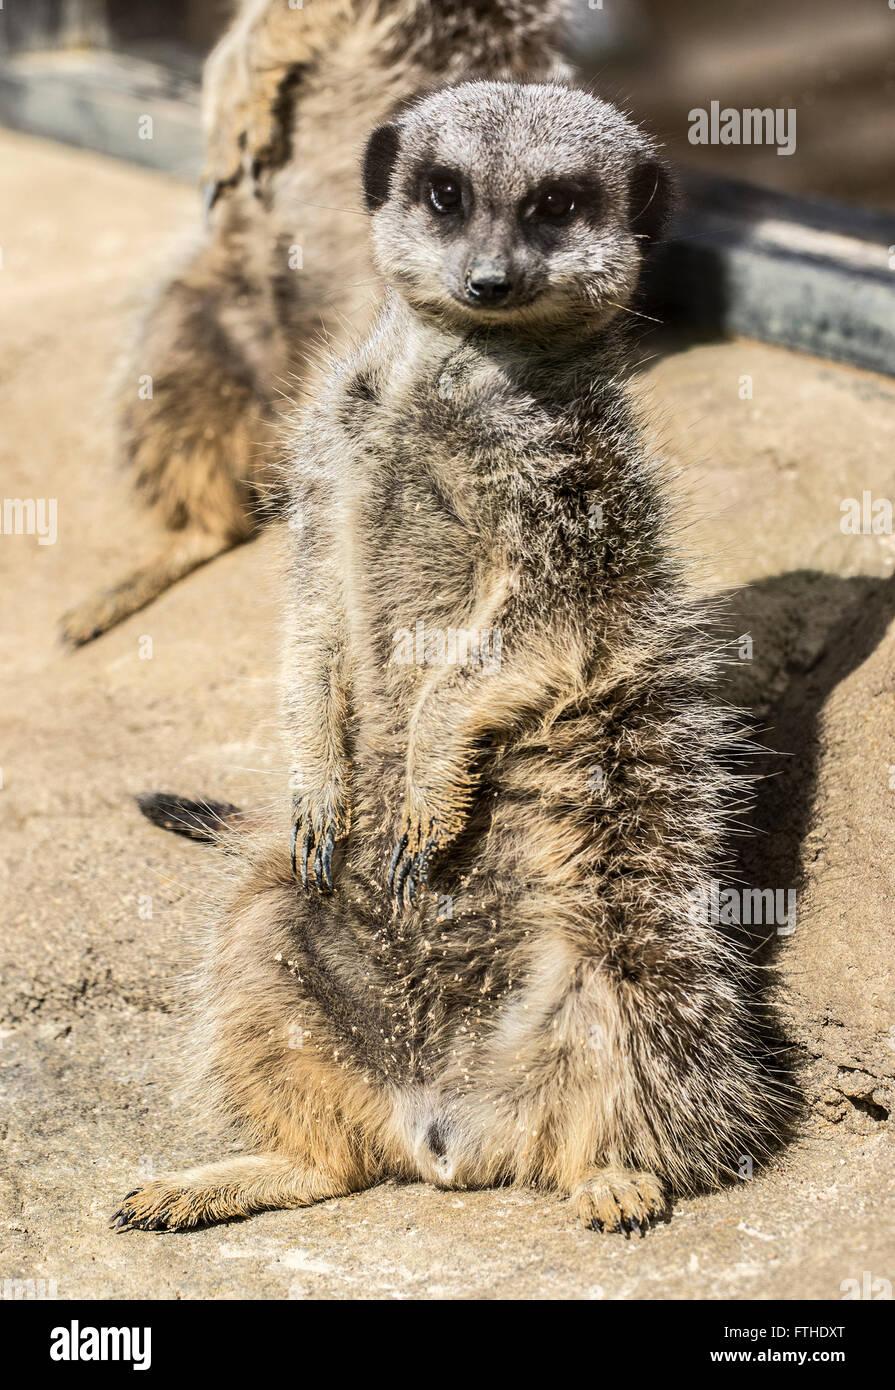 Meerkat sitting in the sun Stock Photo